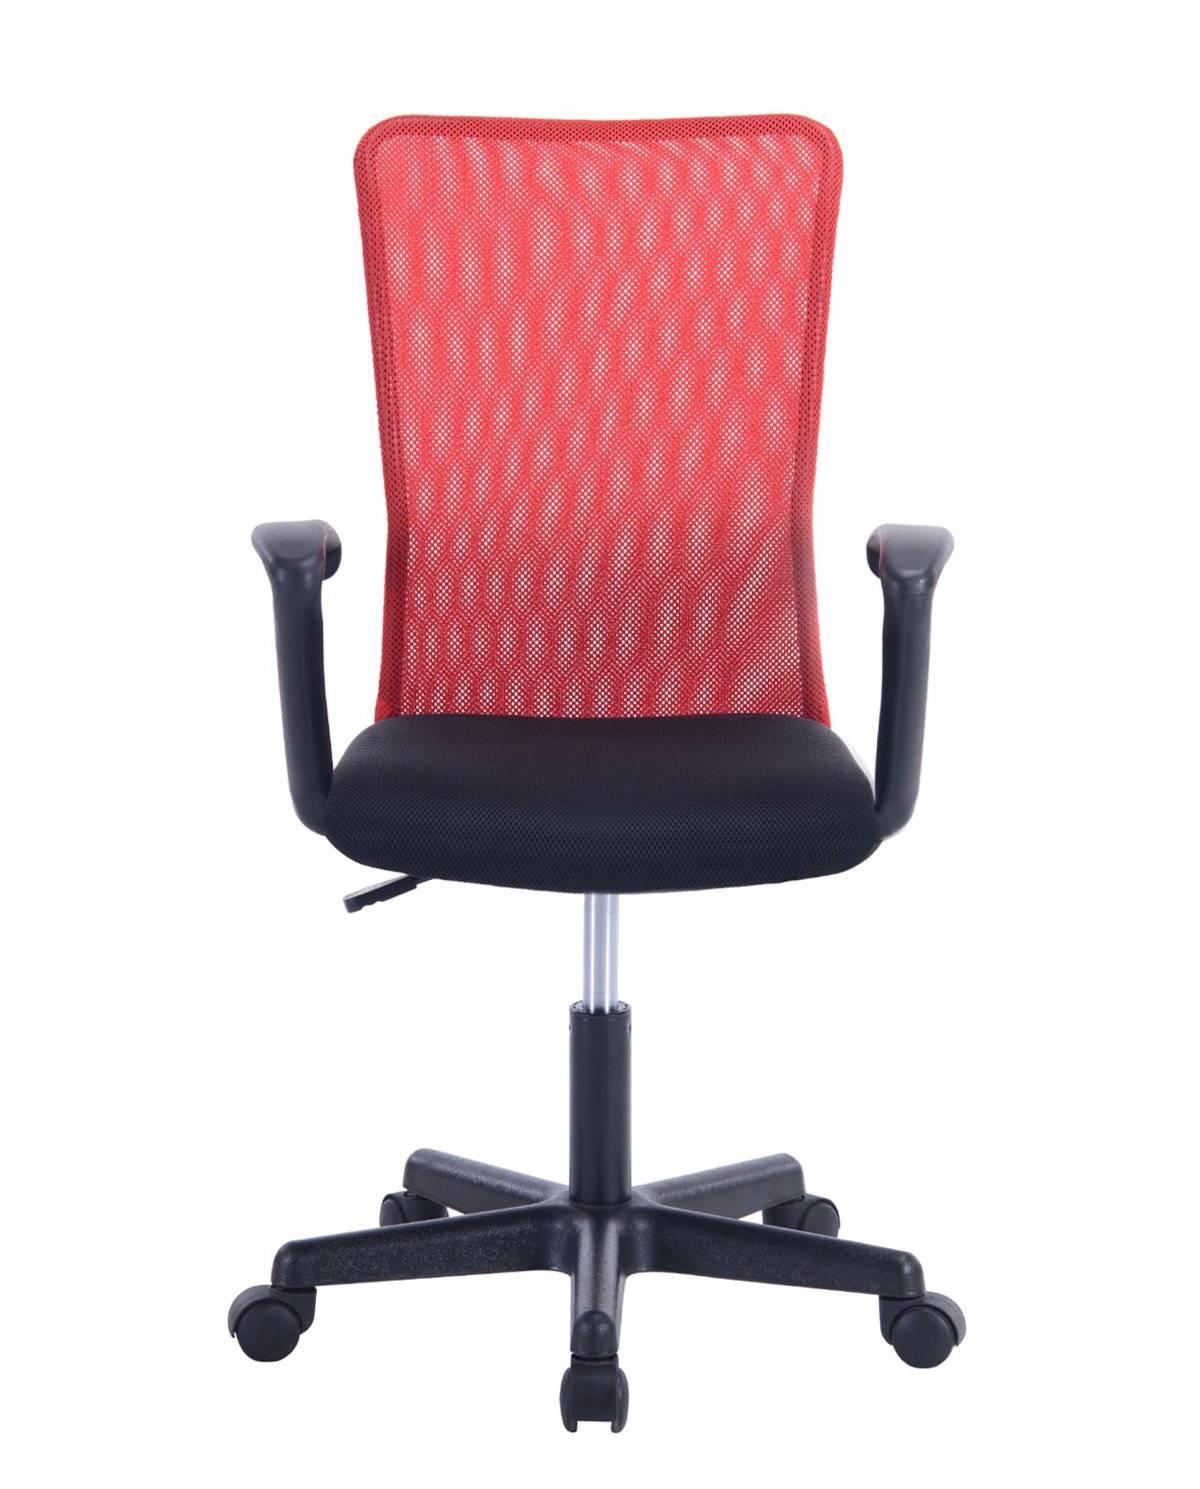 laser chaise de bureau junior. Black Bedroom Furniture Sets. Home Design Ideas